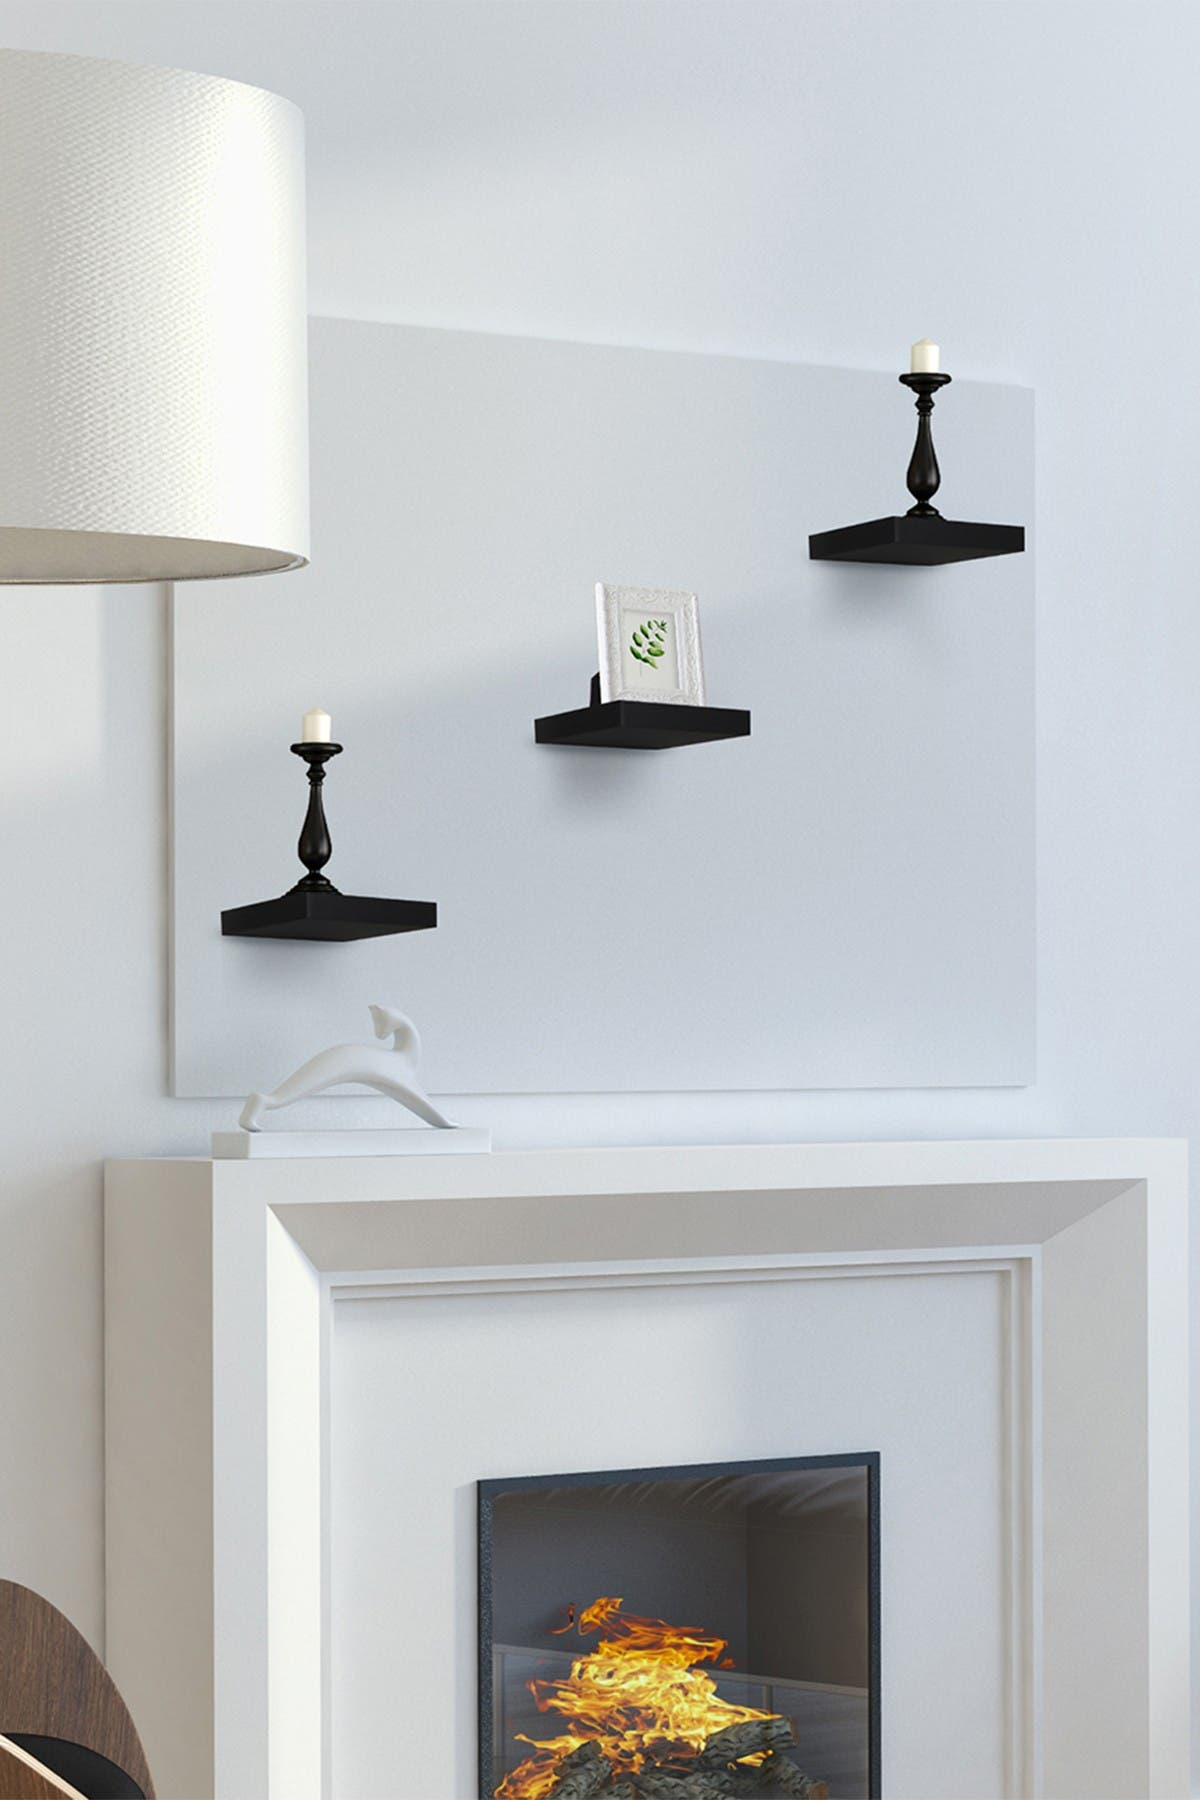 Image of Sorbus Tile Wall Shelf - Set of 3 - Black